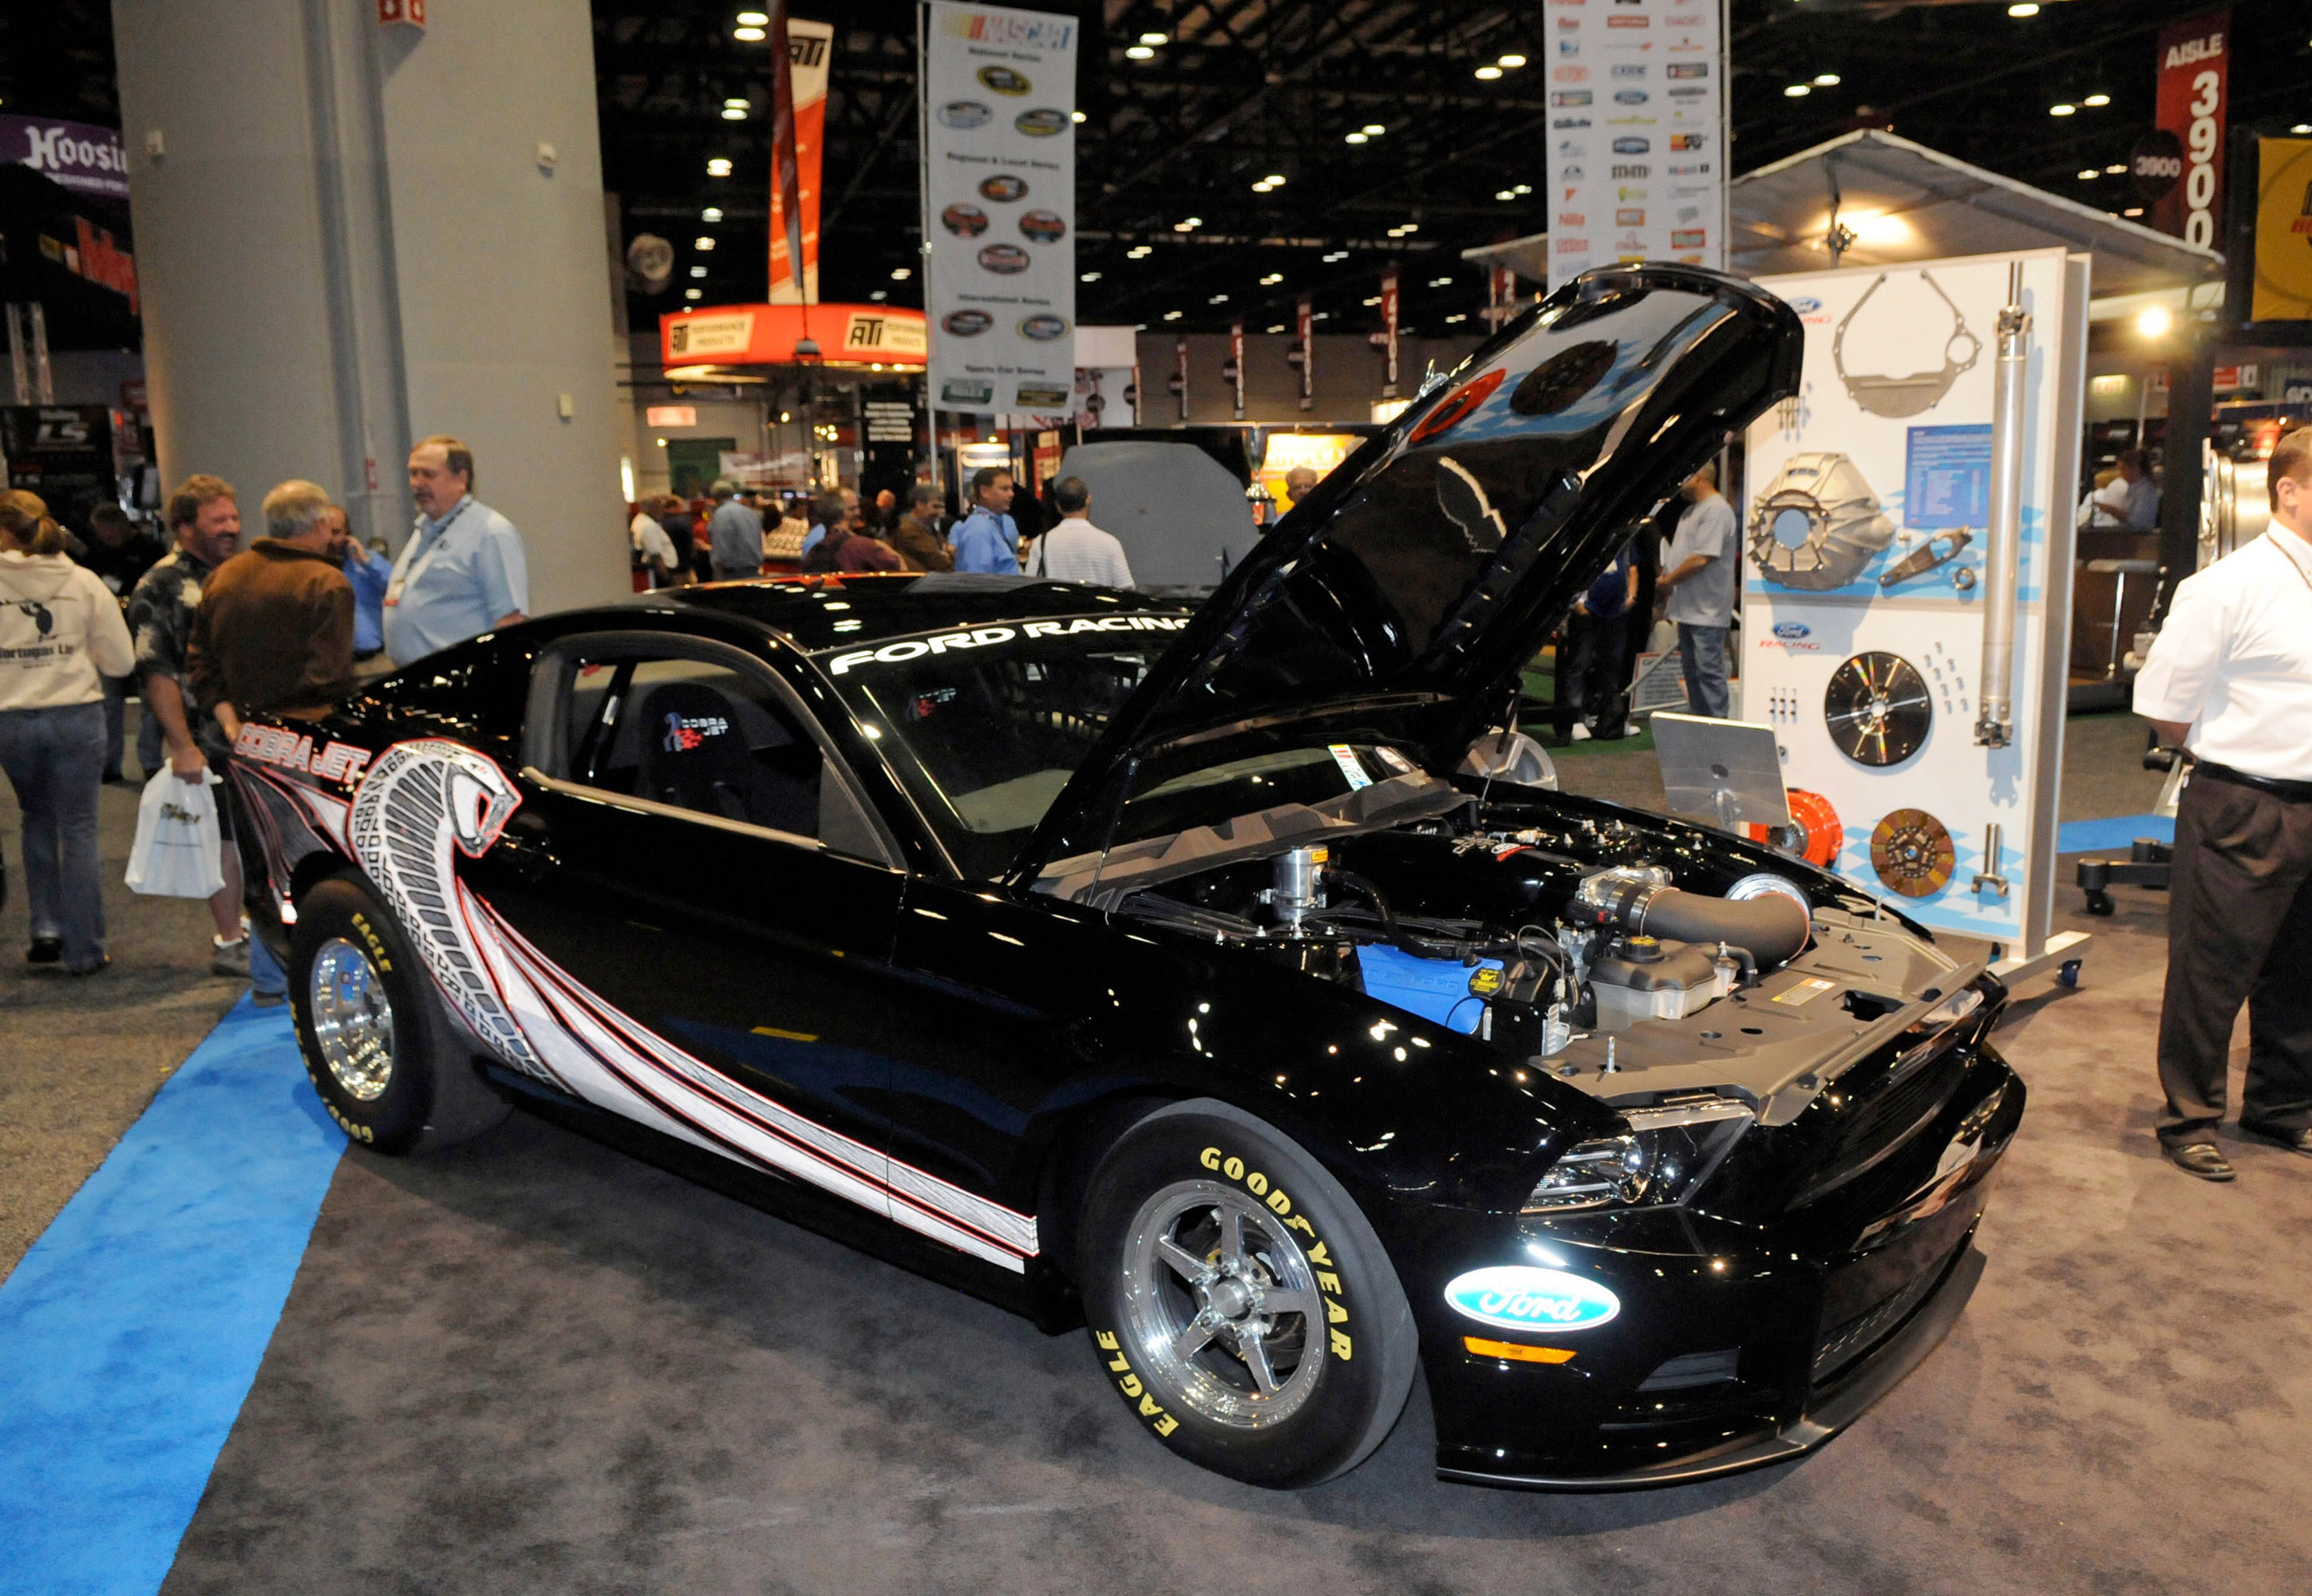 2013 Ford Mustang Cobra Jet